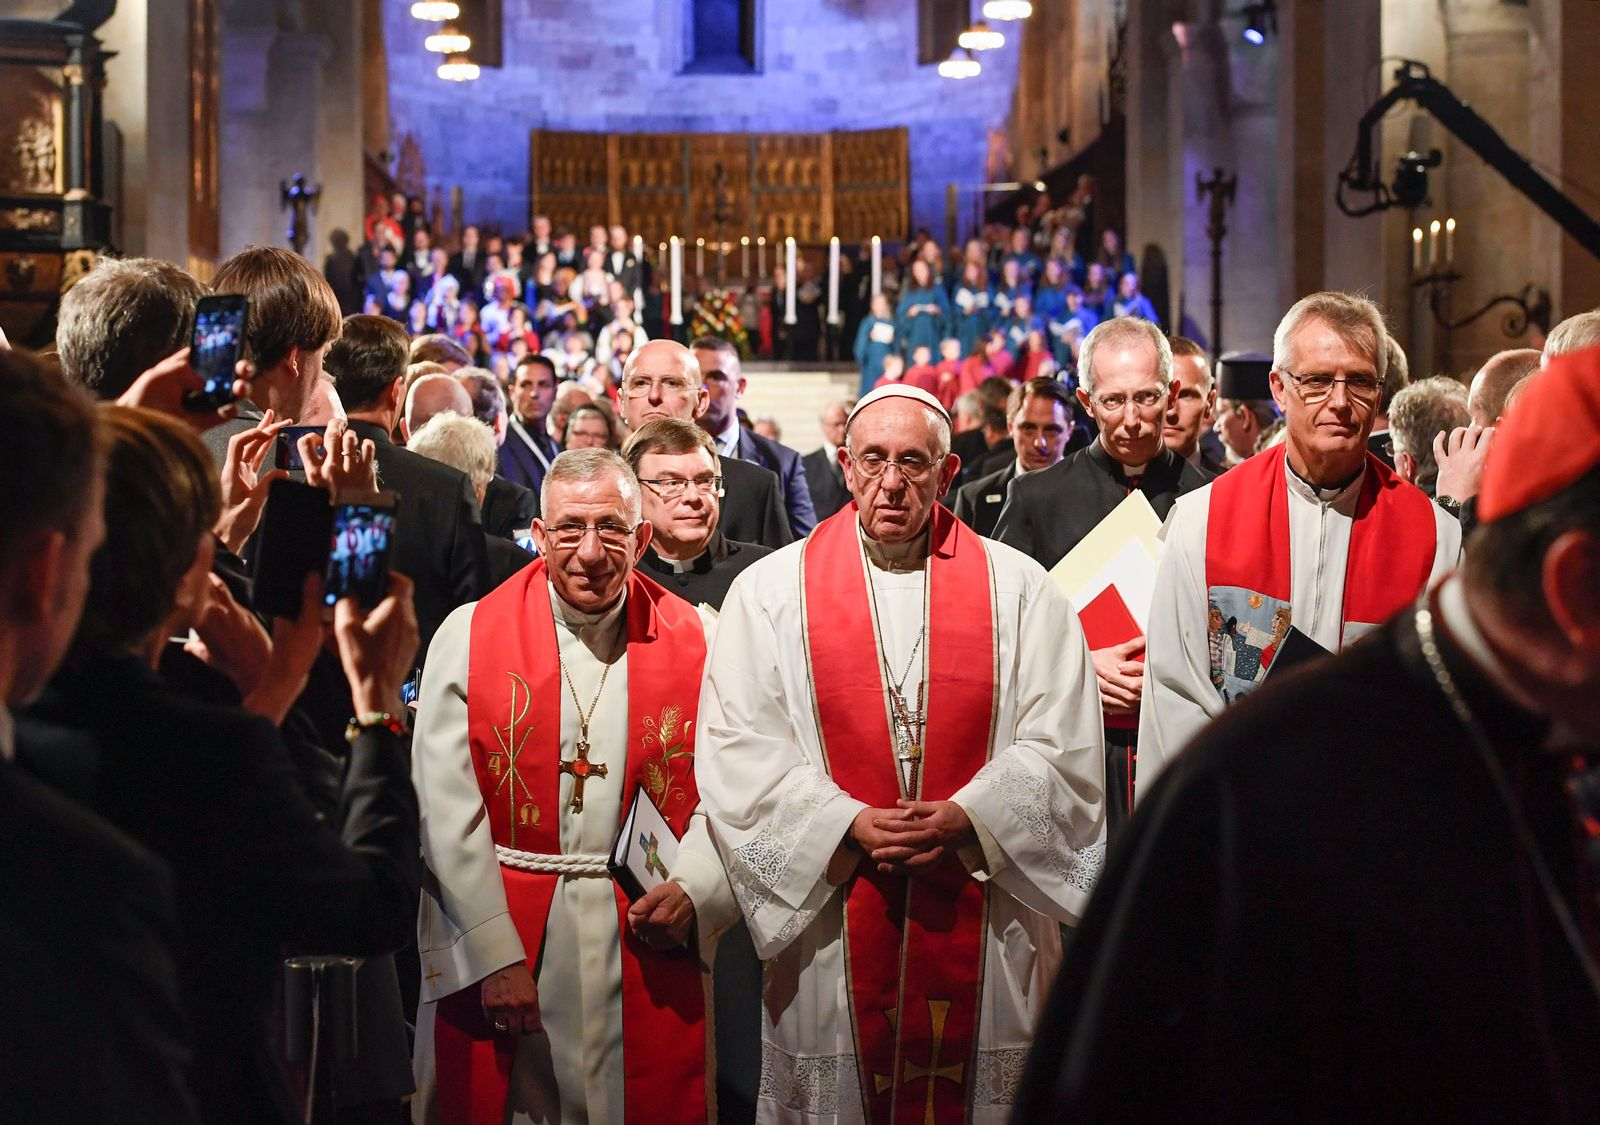 POPE-SWEDEN/